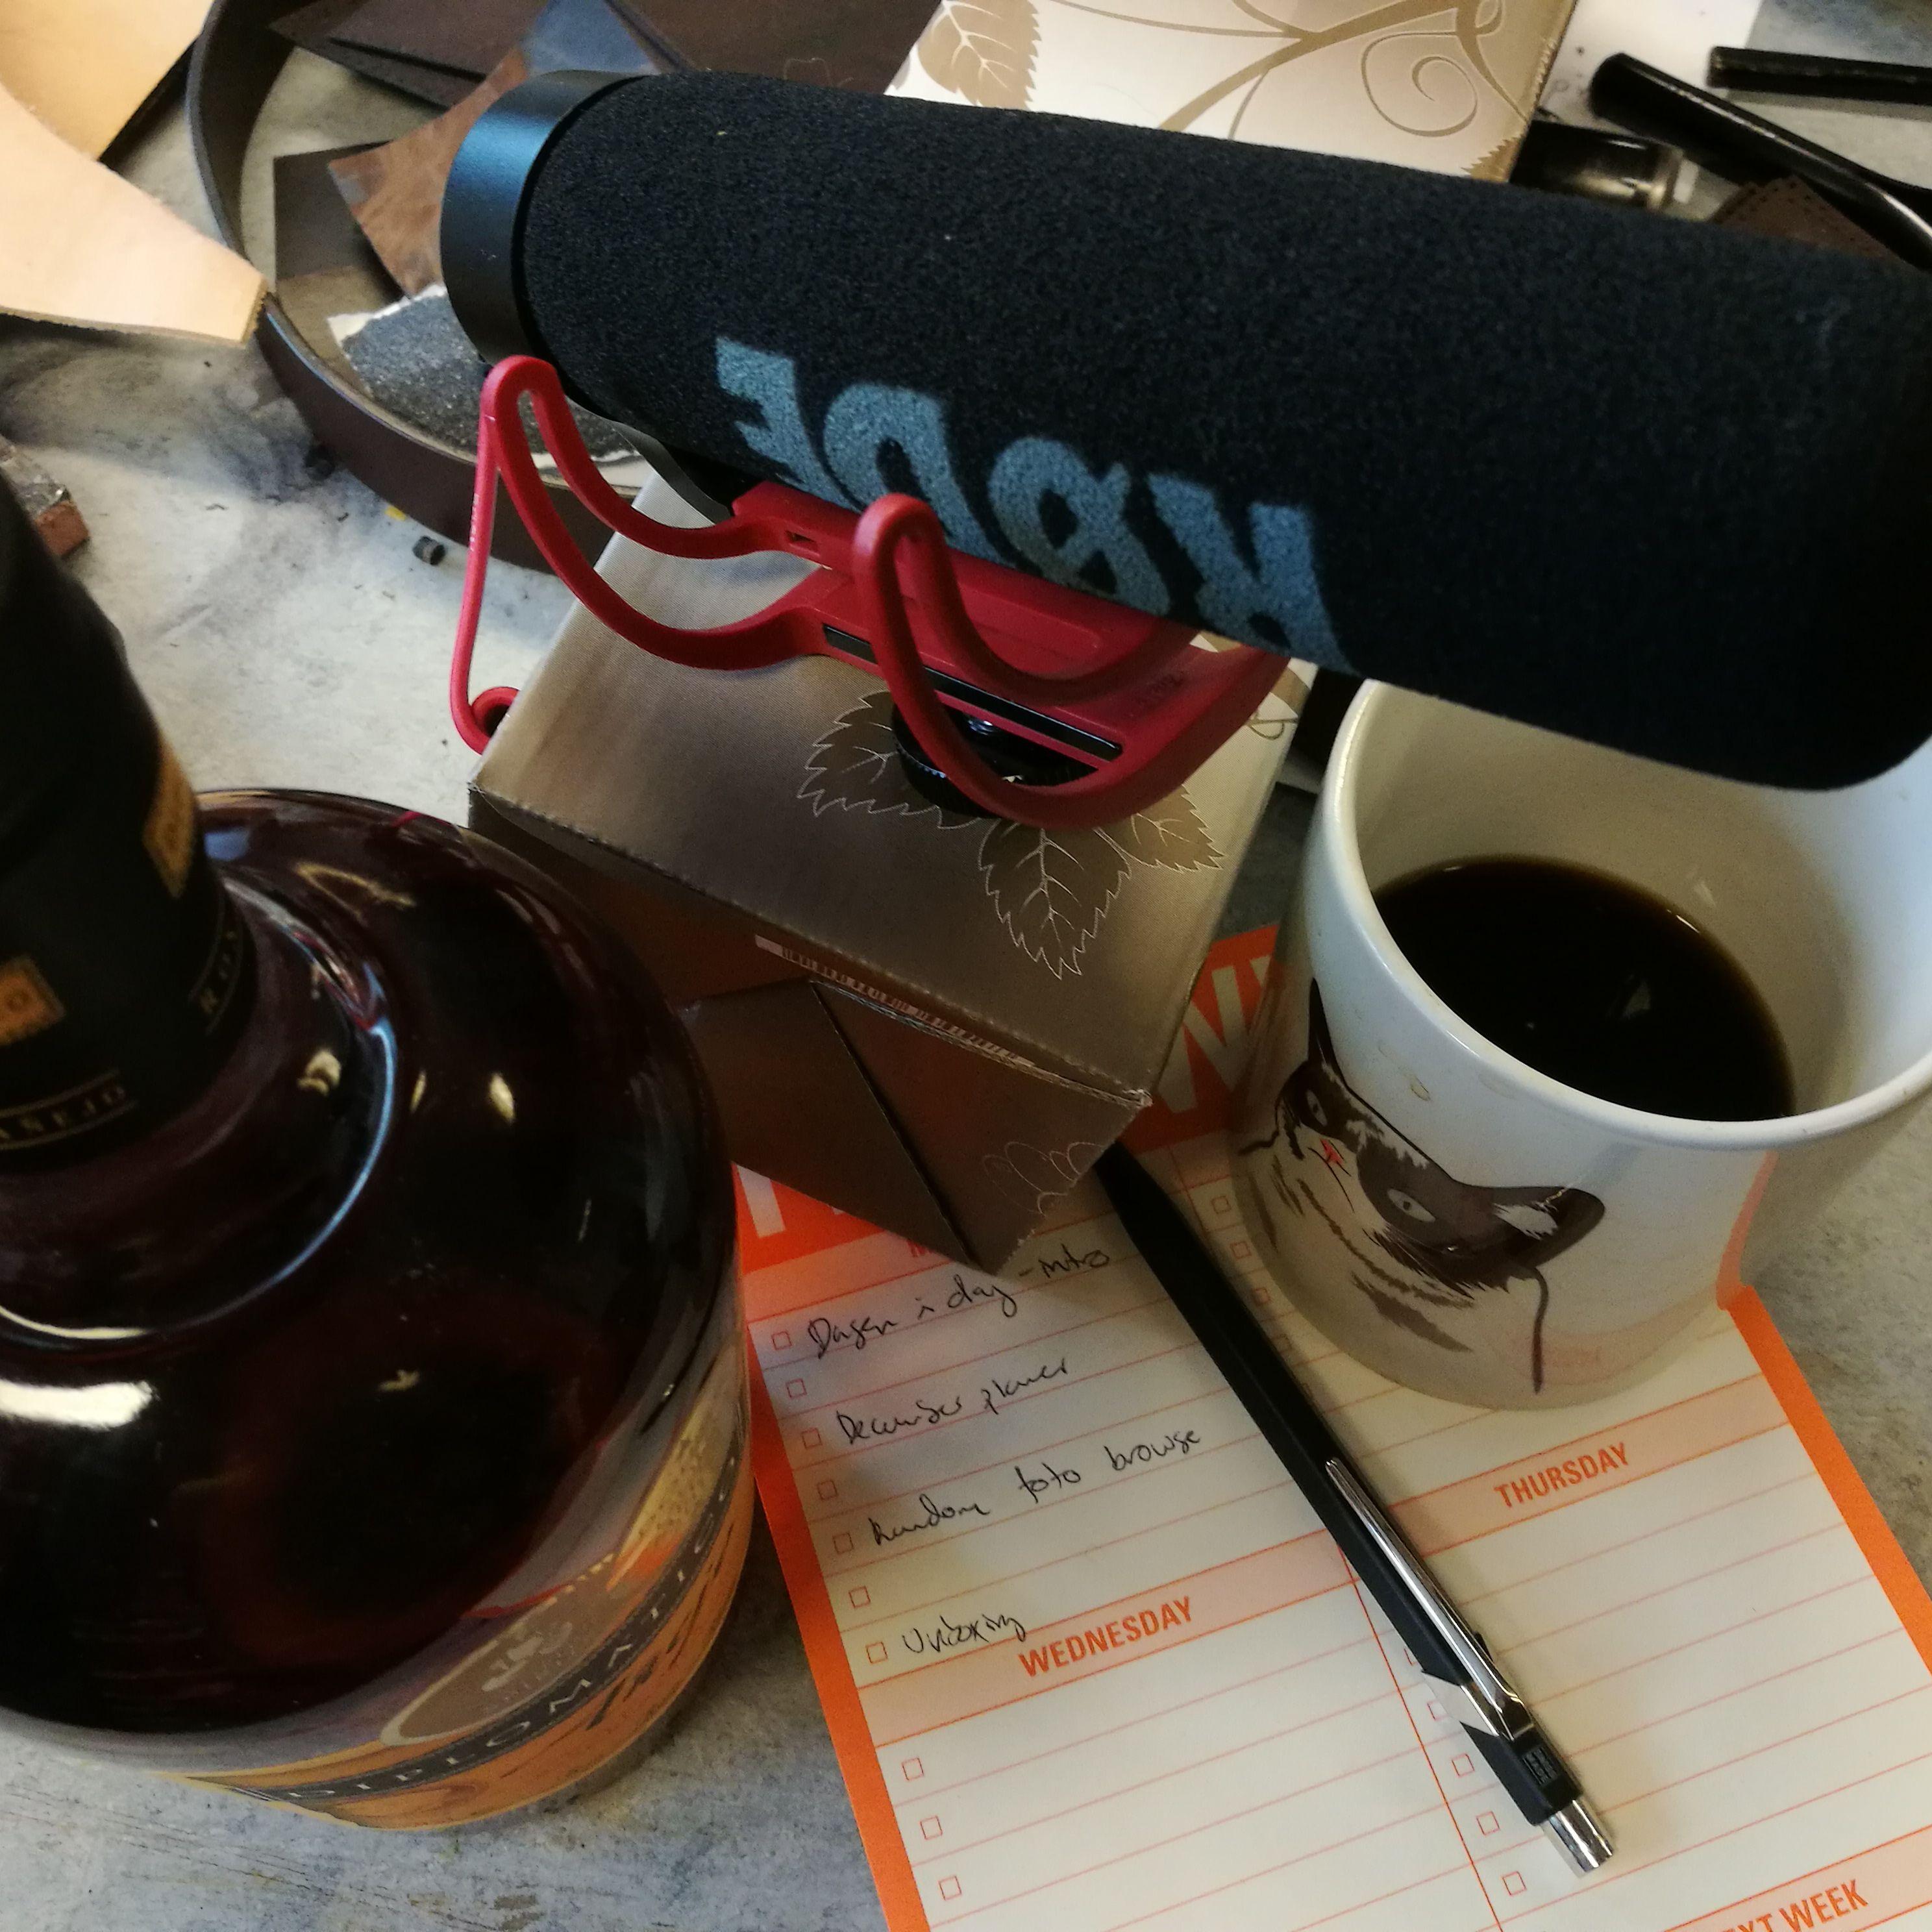 My Pleasuredk Nicolai Klingenberg Free Listening On Soundcloud Ps4 Birthdays The Beginning Reg 2